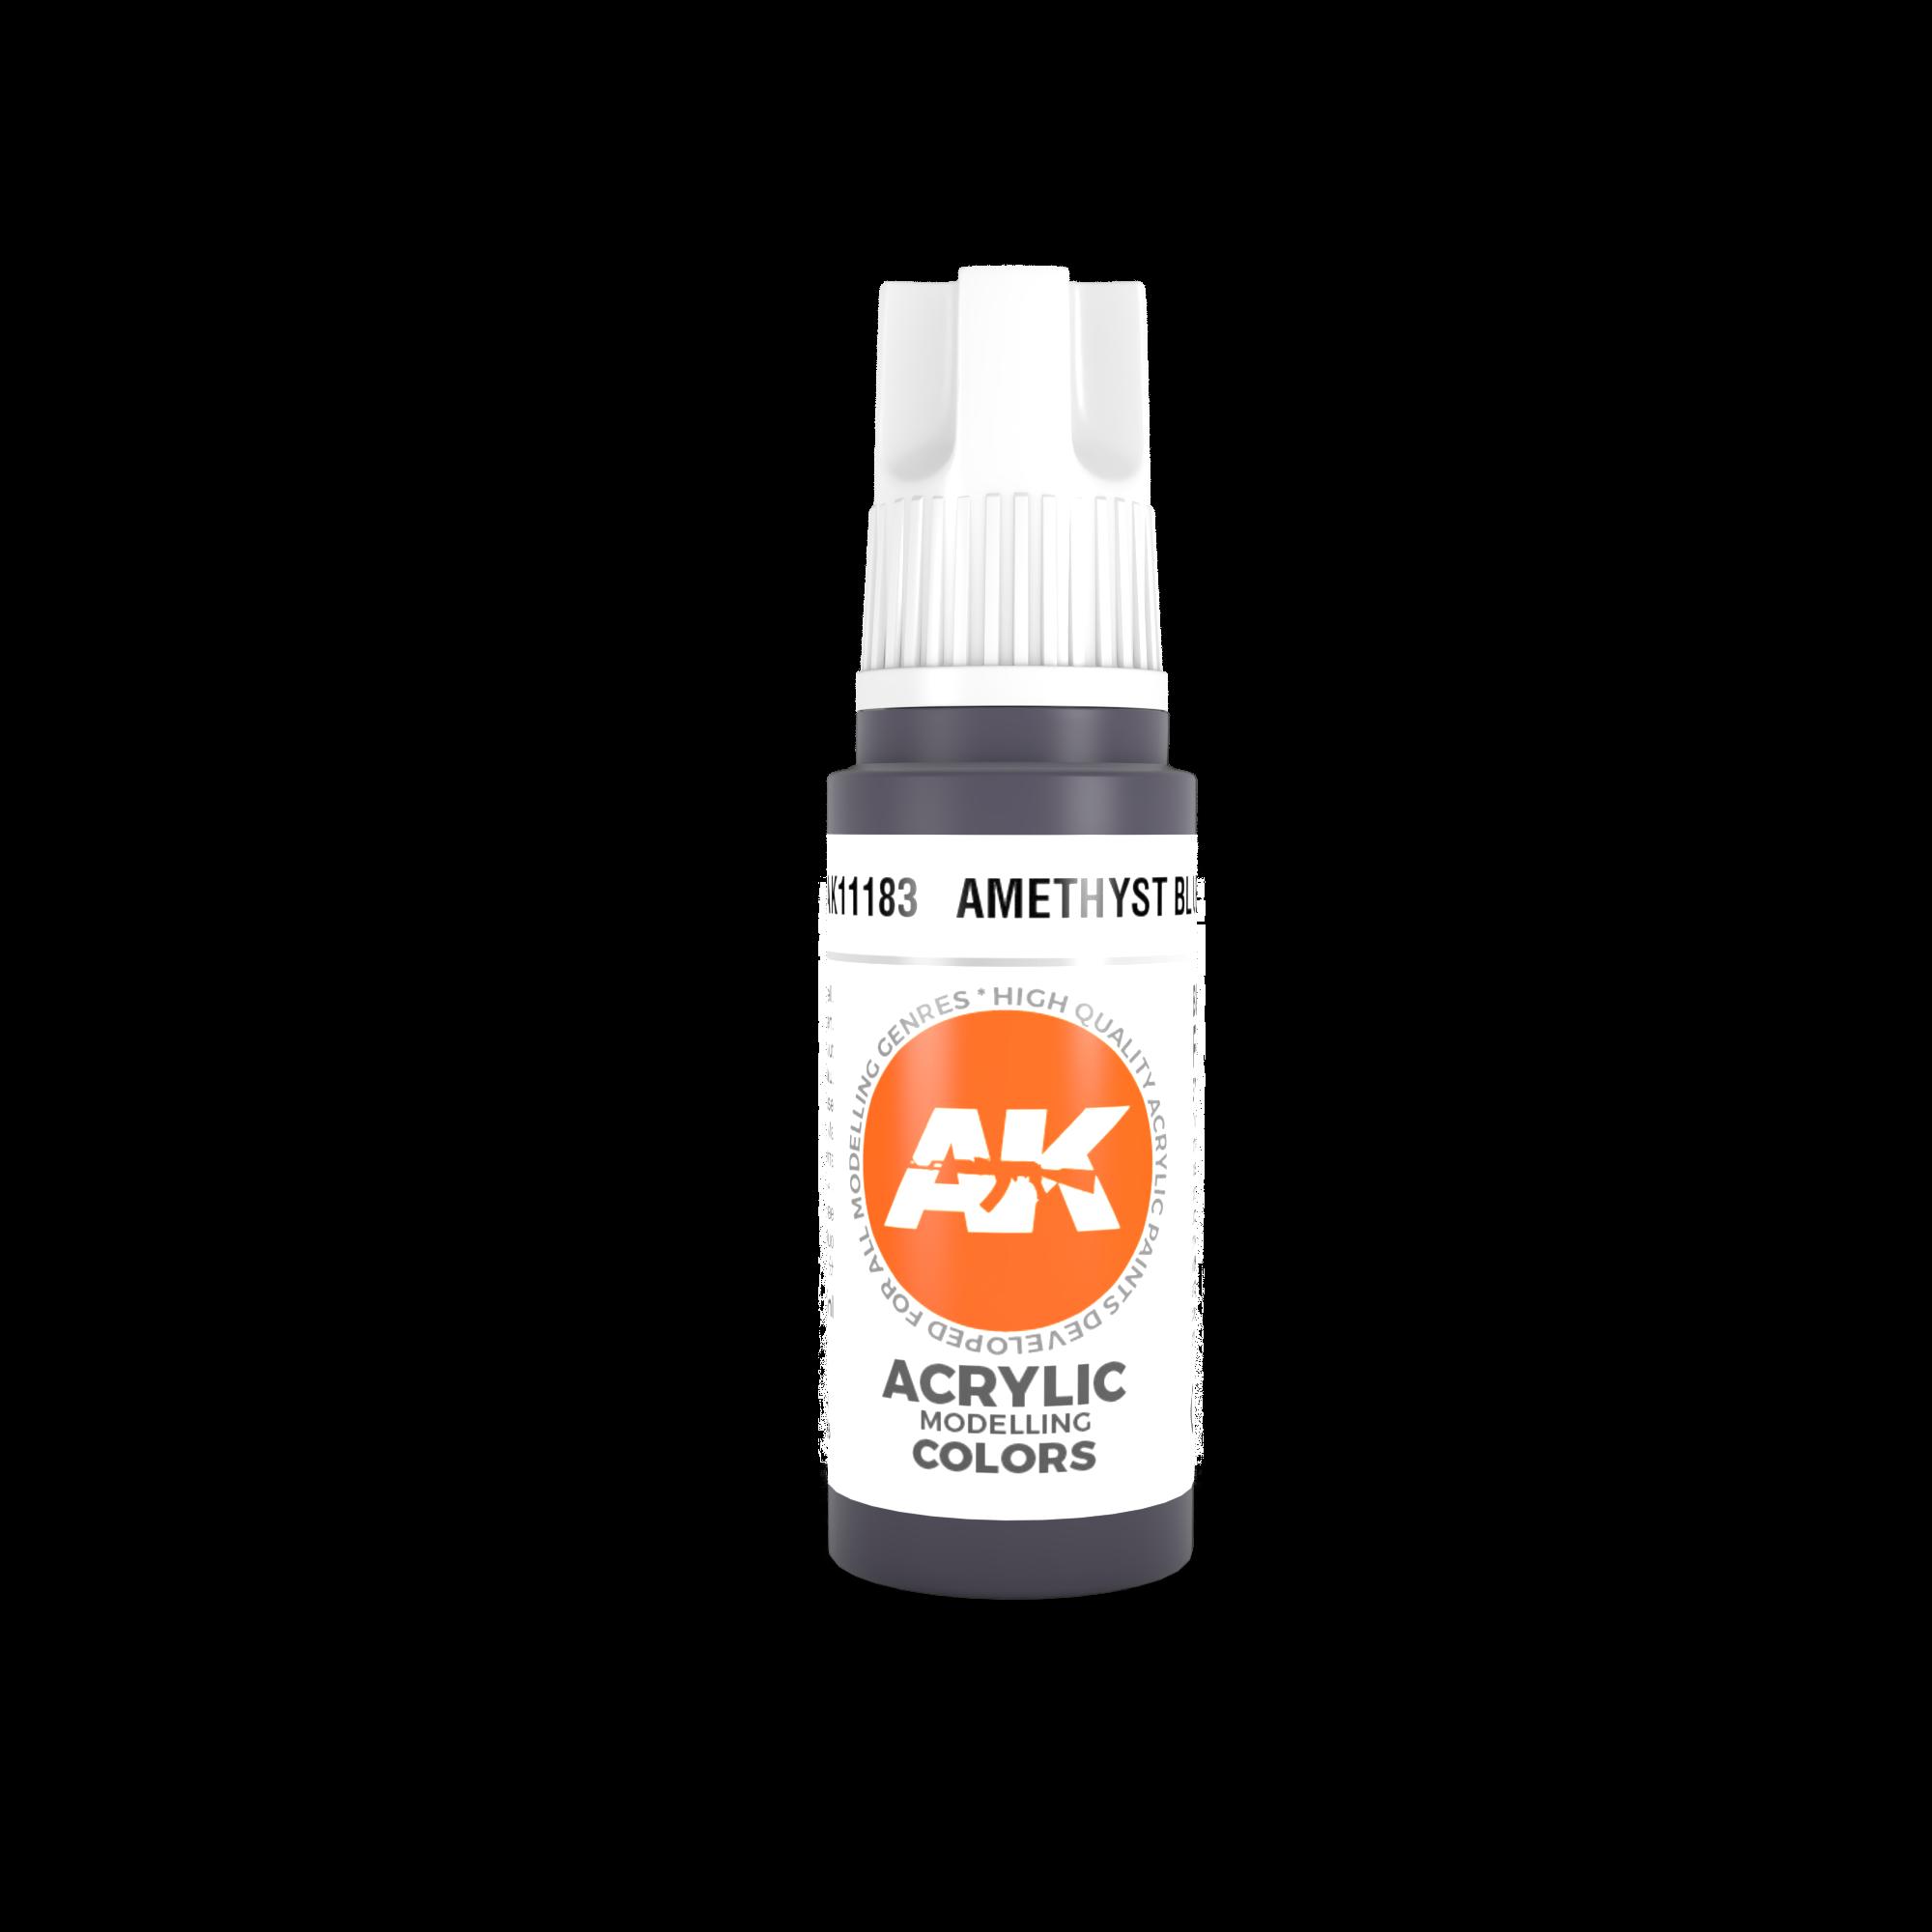 AK-Interactive Amethyst Blue Acrylic Modelling Color - 17ml - AK-11183